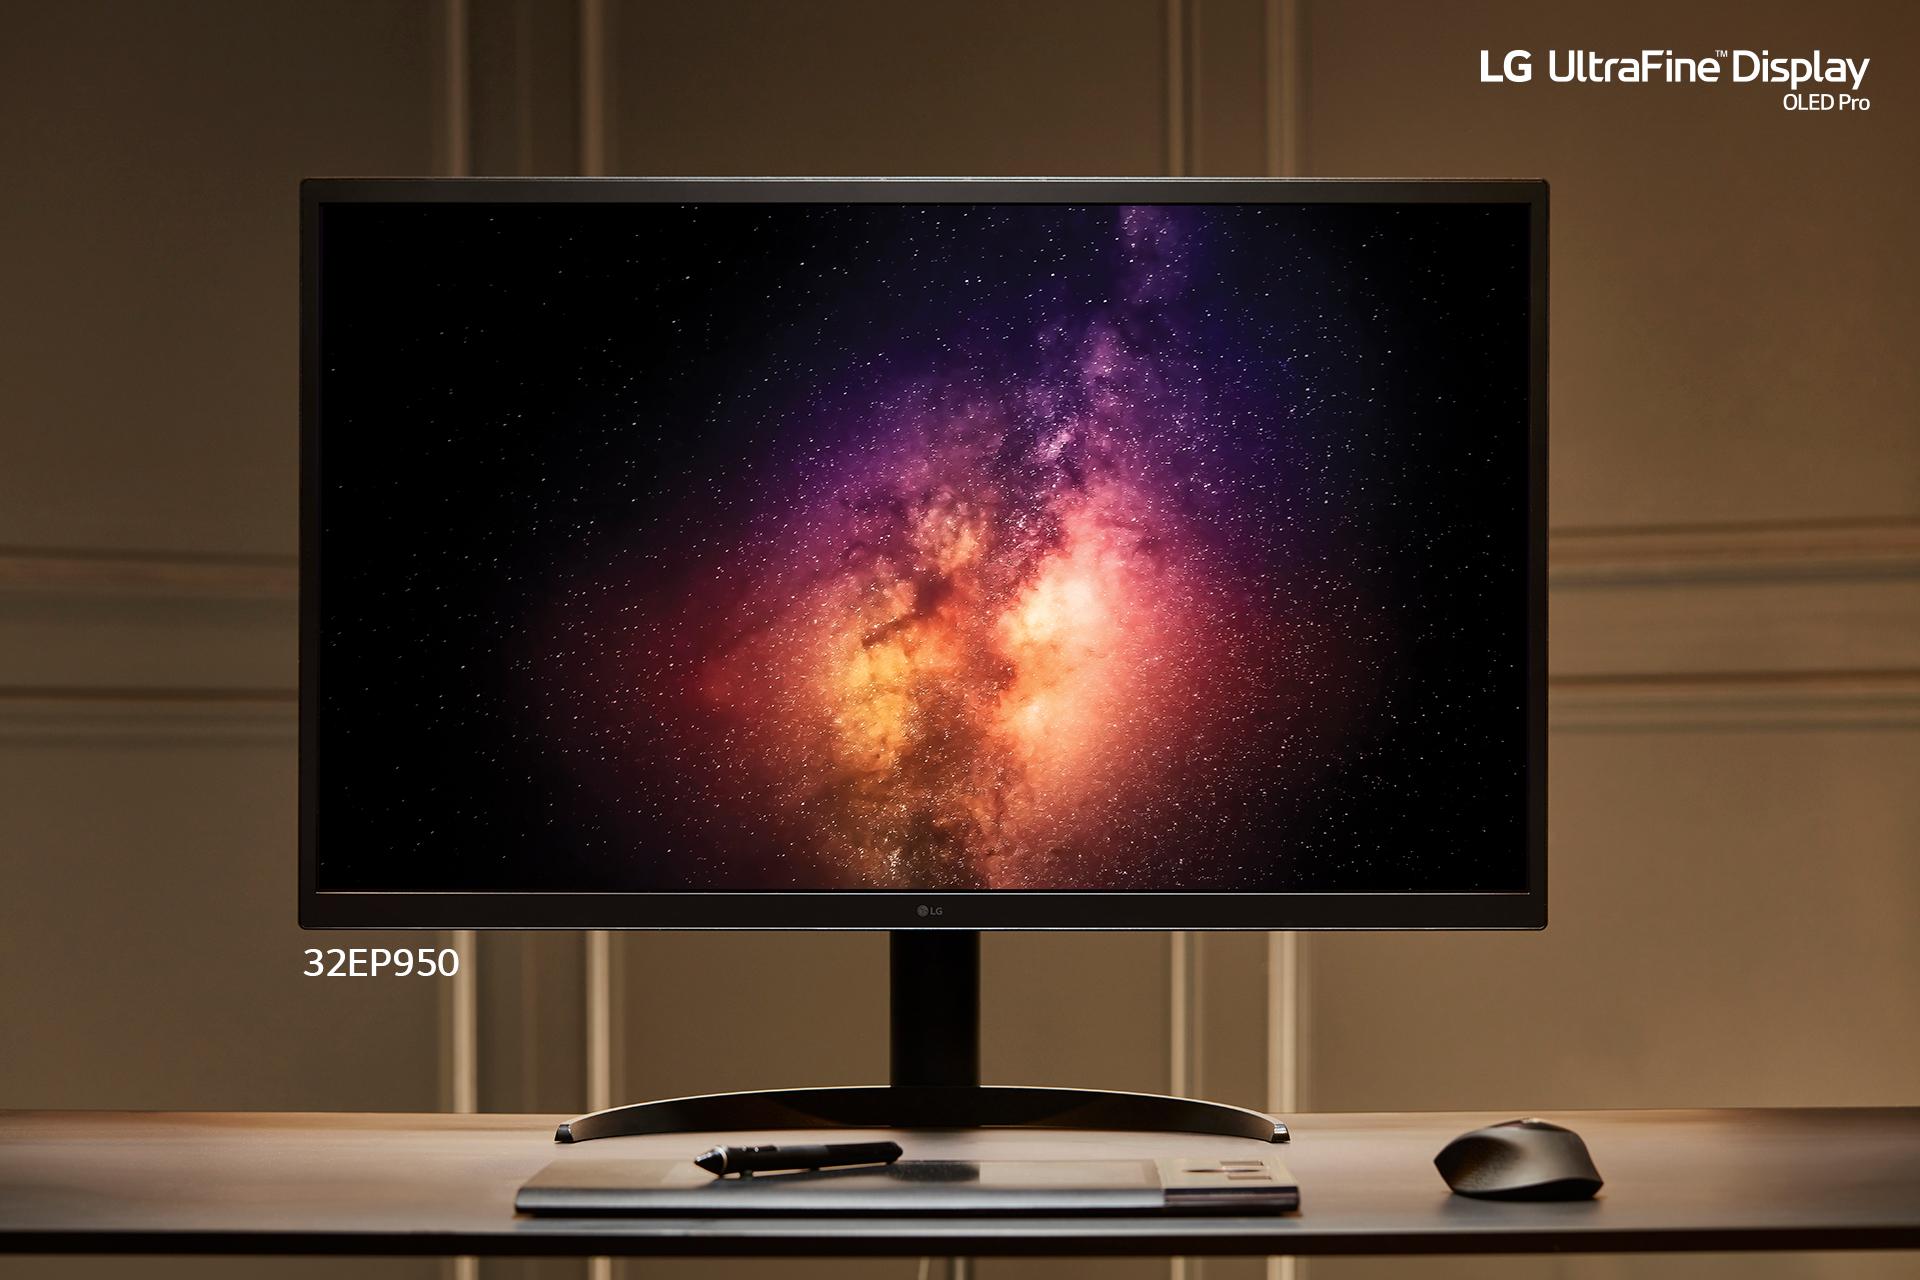 UltraFine Display OLED Pro